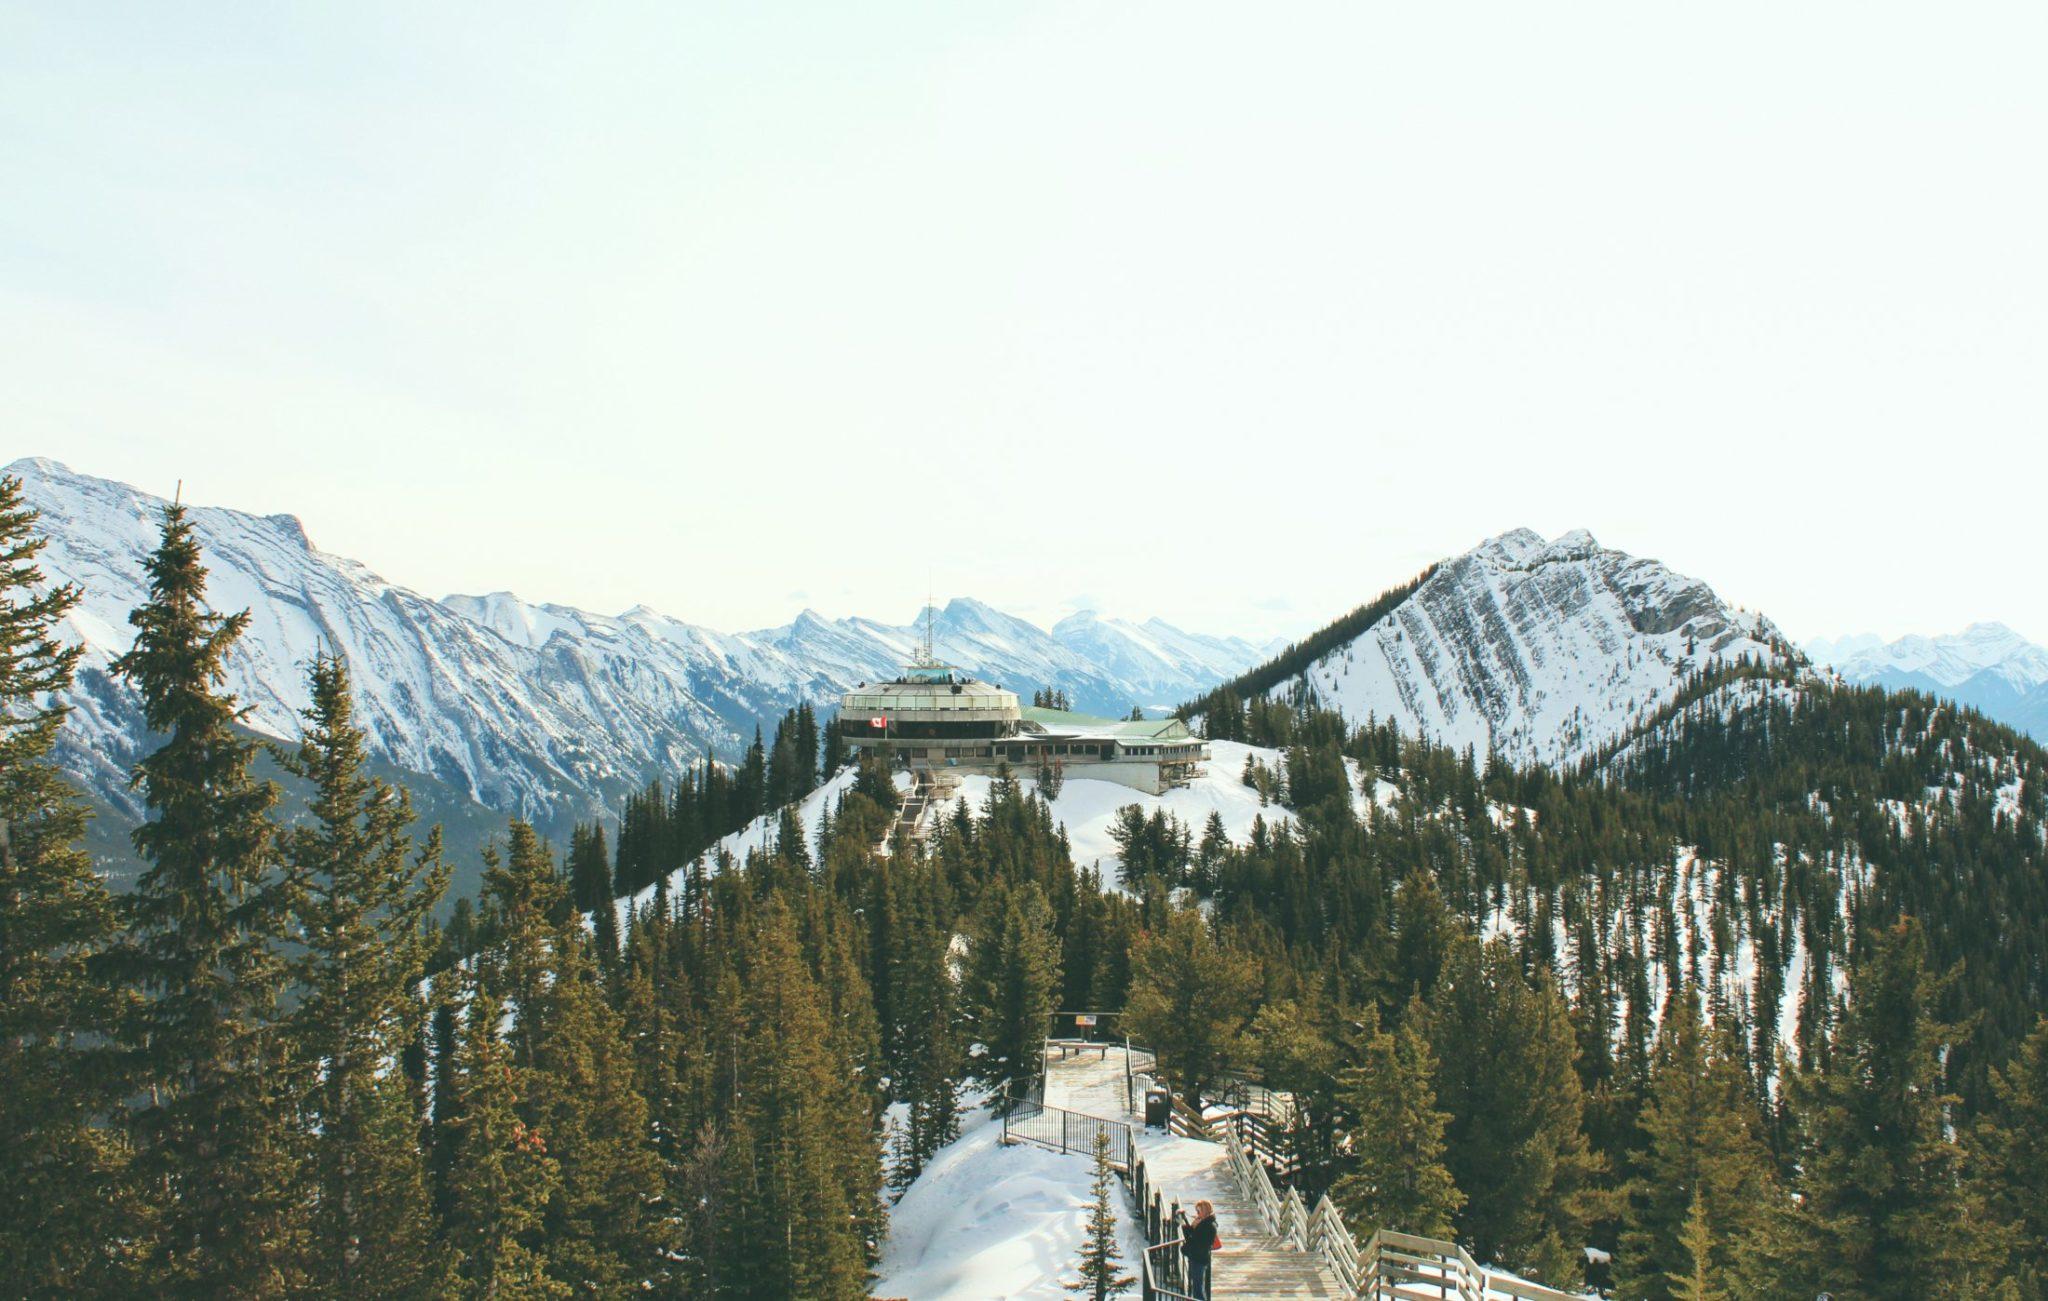 A mountain landscape in Banff, Canada